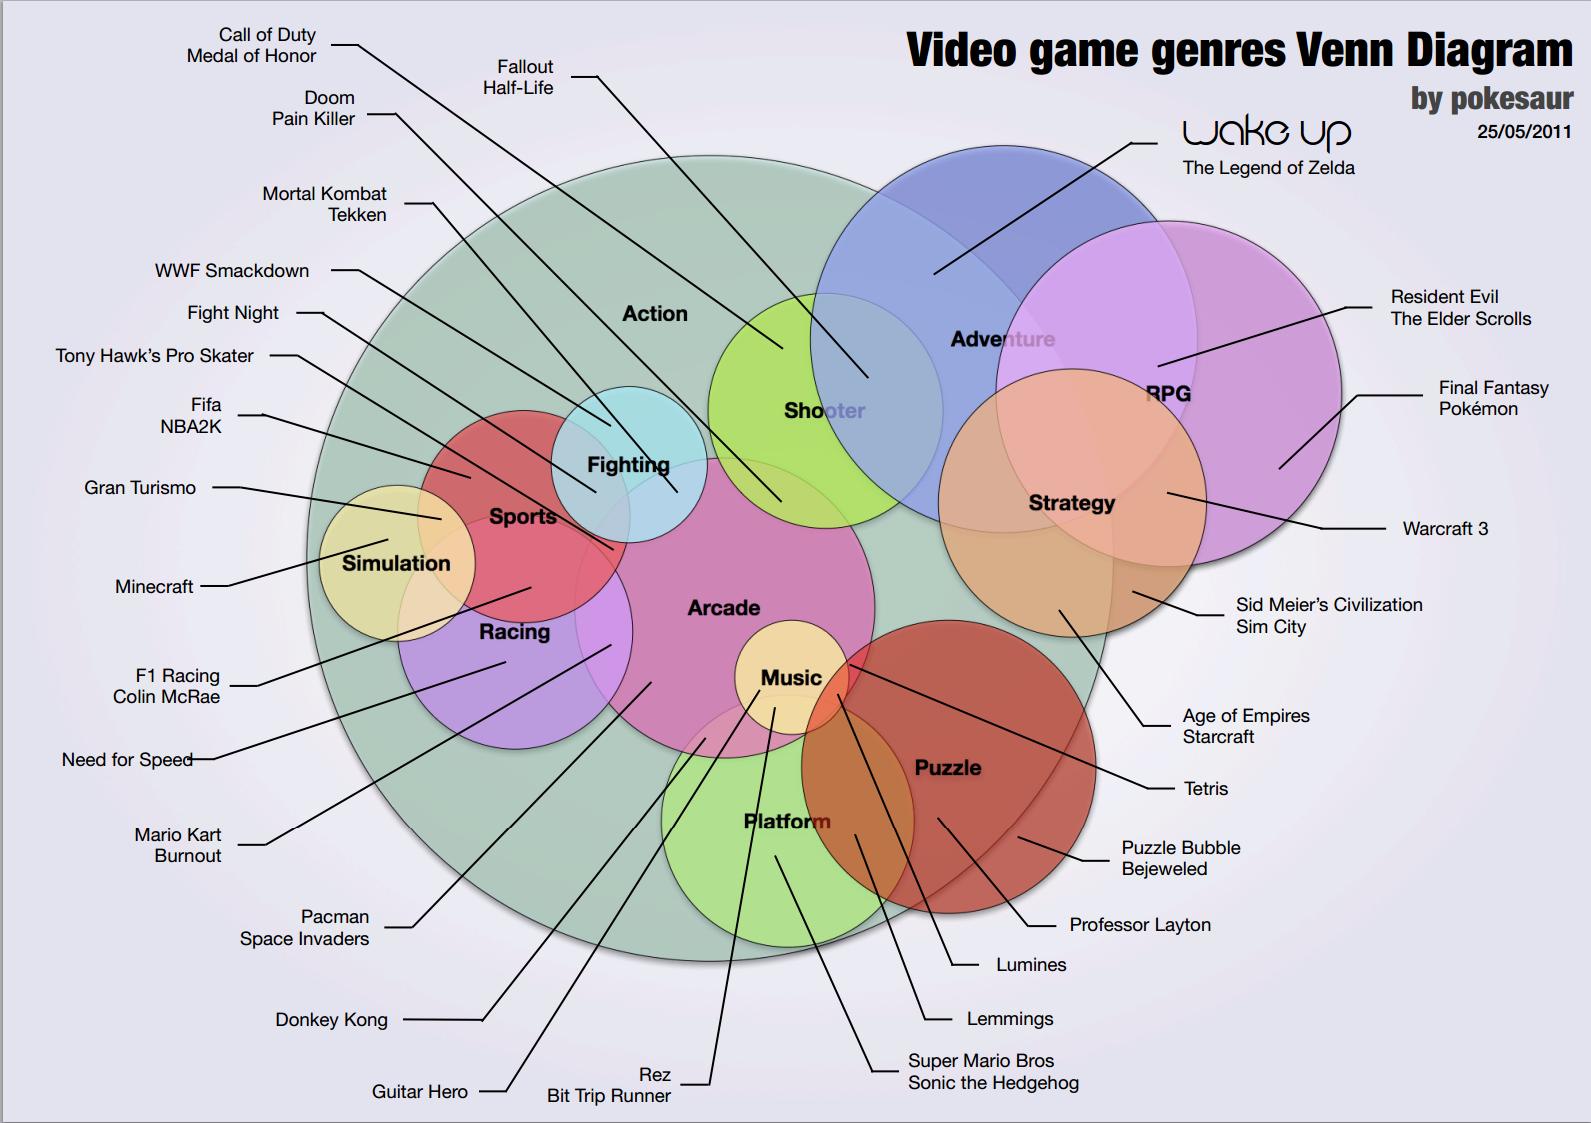 Video game genre venn diagram games pinterest video game genre venn diagram ccuart Images